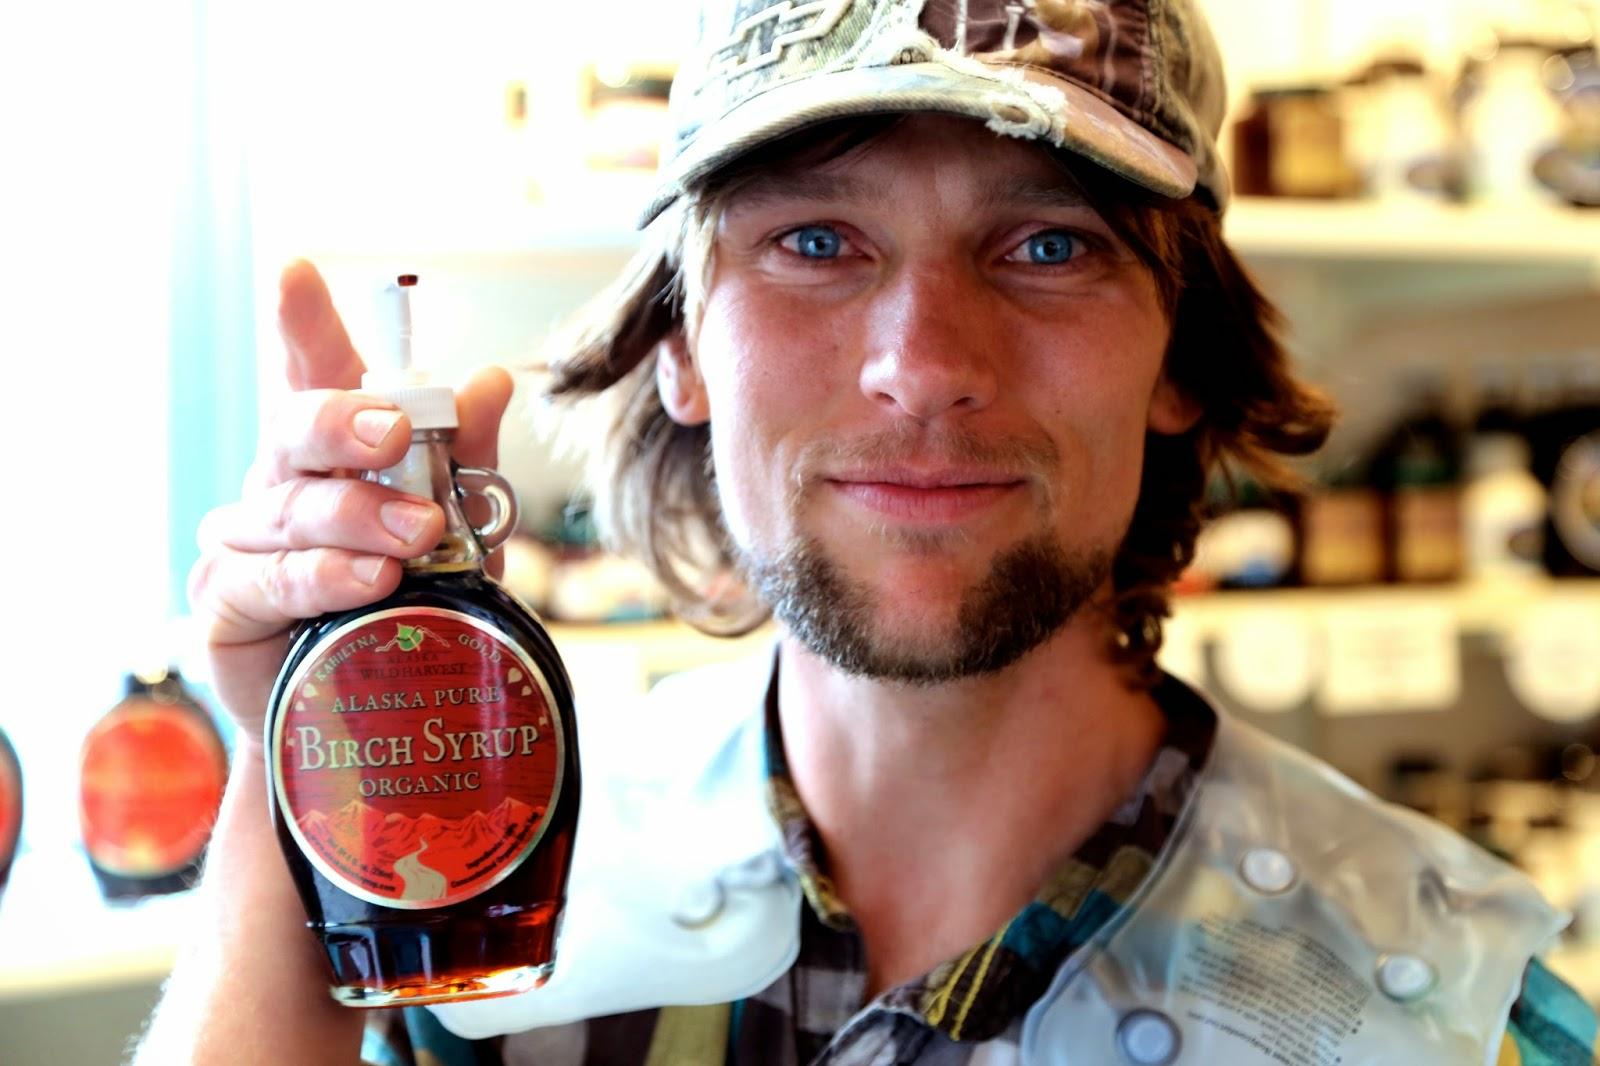 Birch syrup, Alaska State Fair